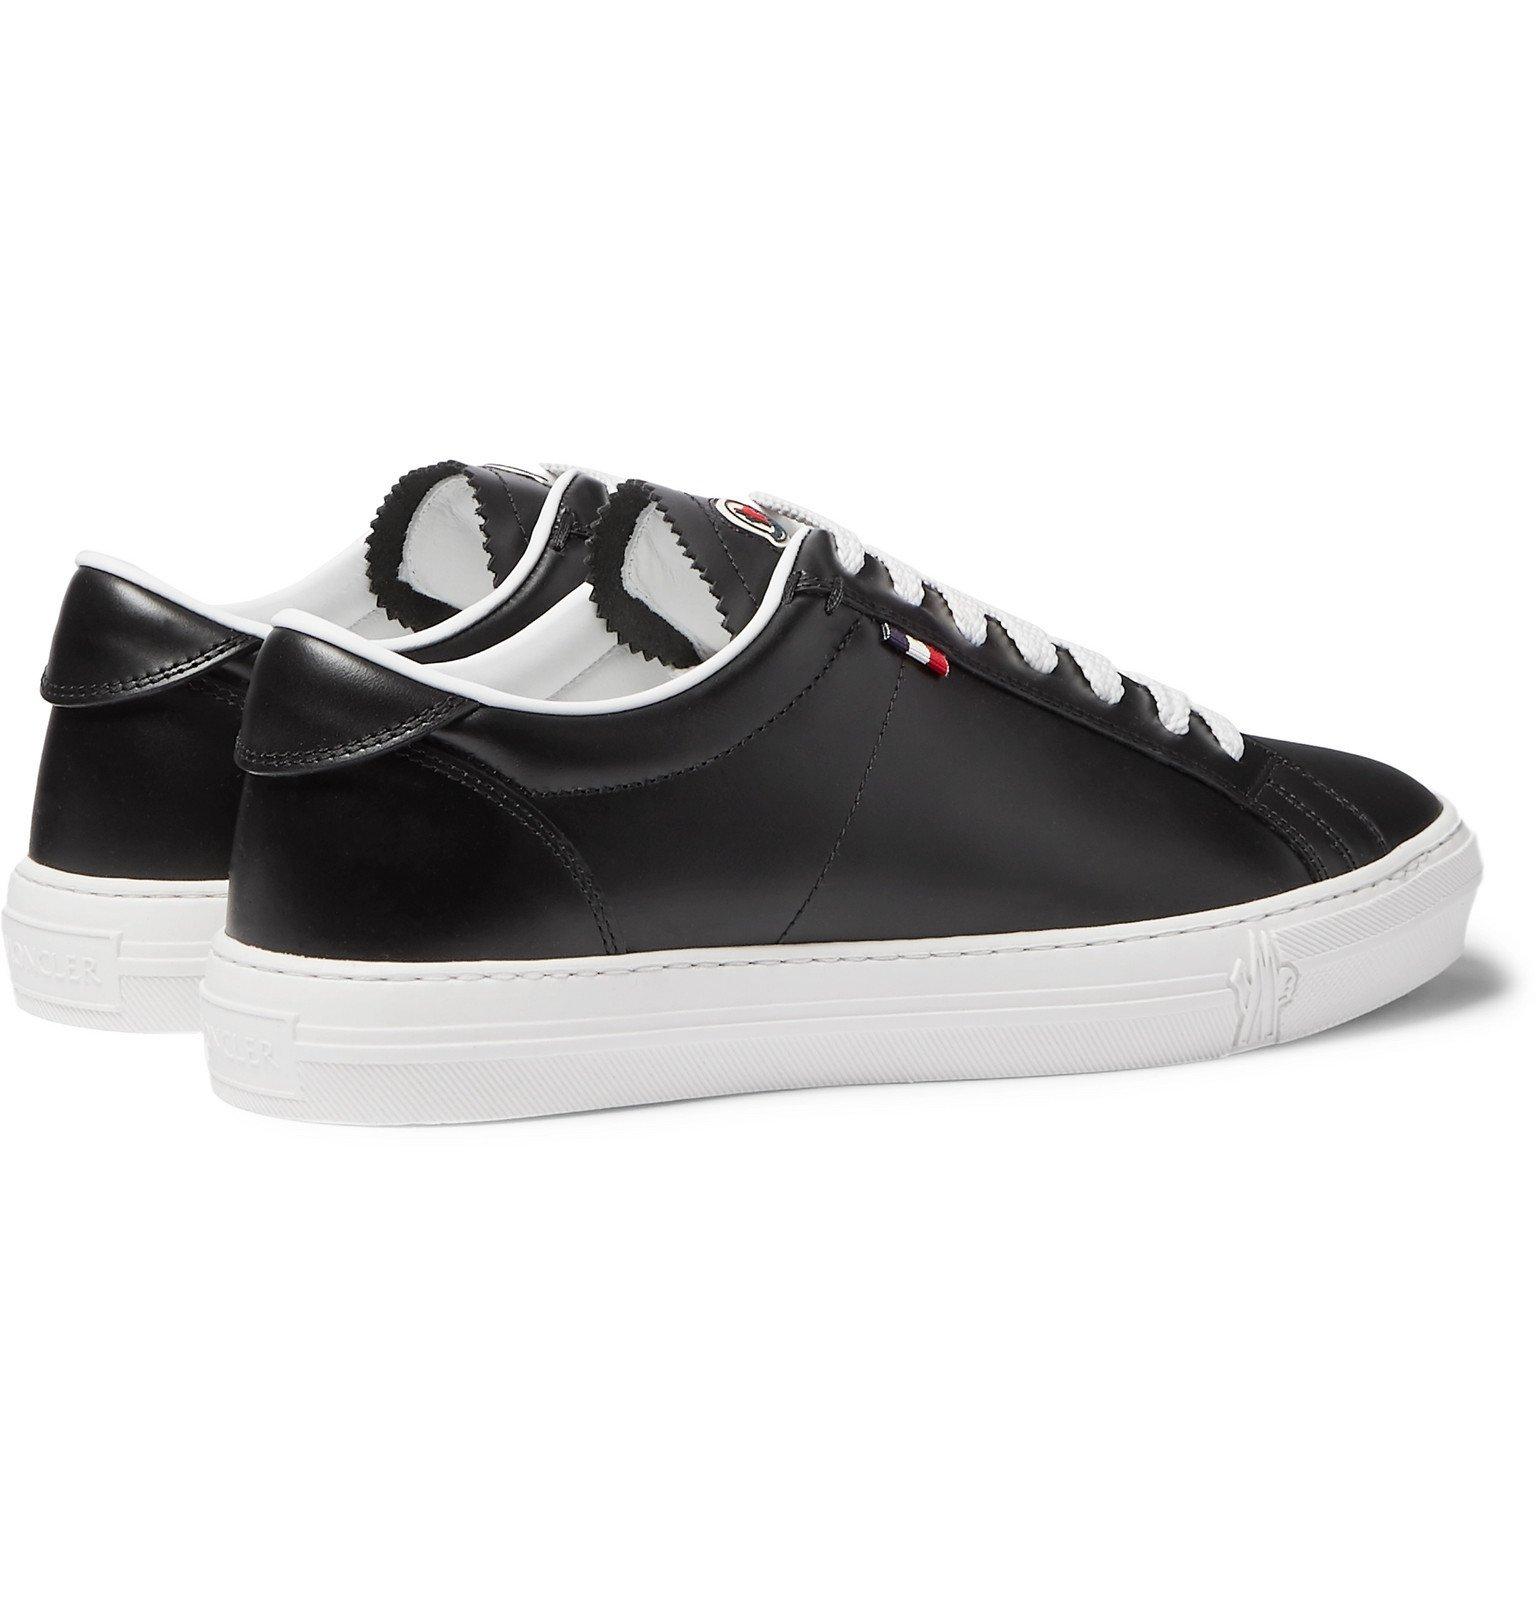 Moncler - Monaco Leather Sneakers - Black